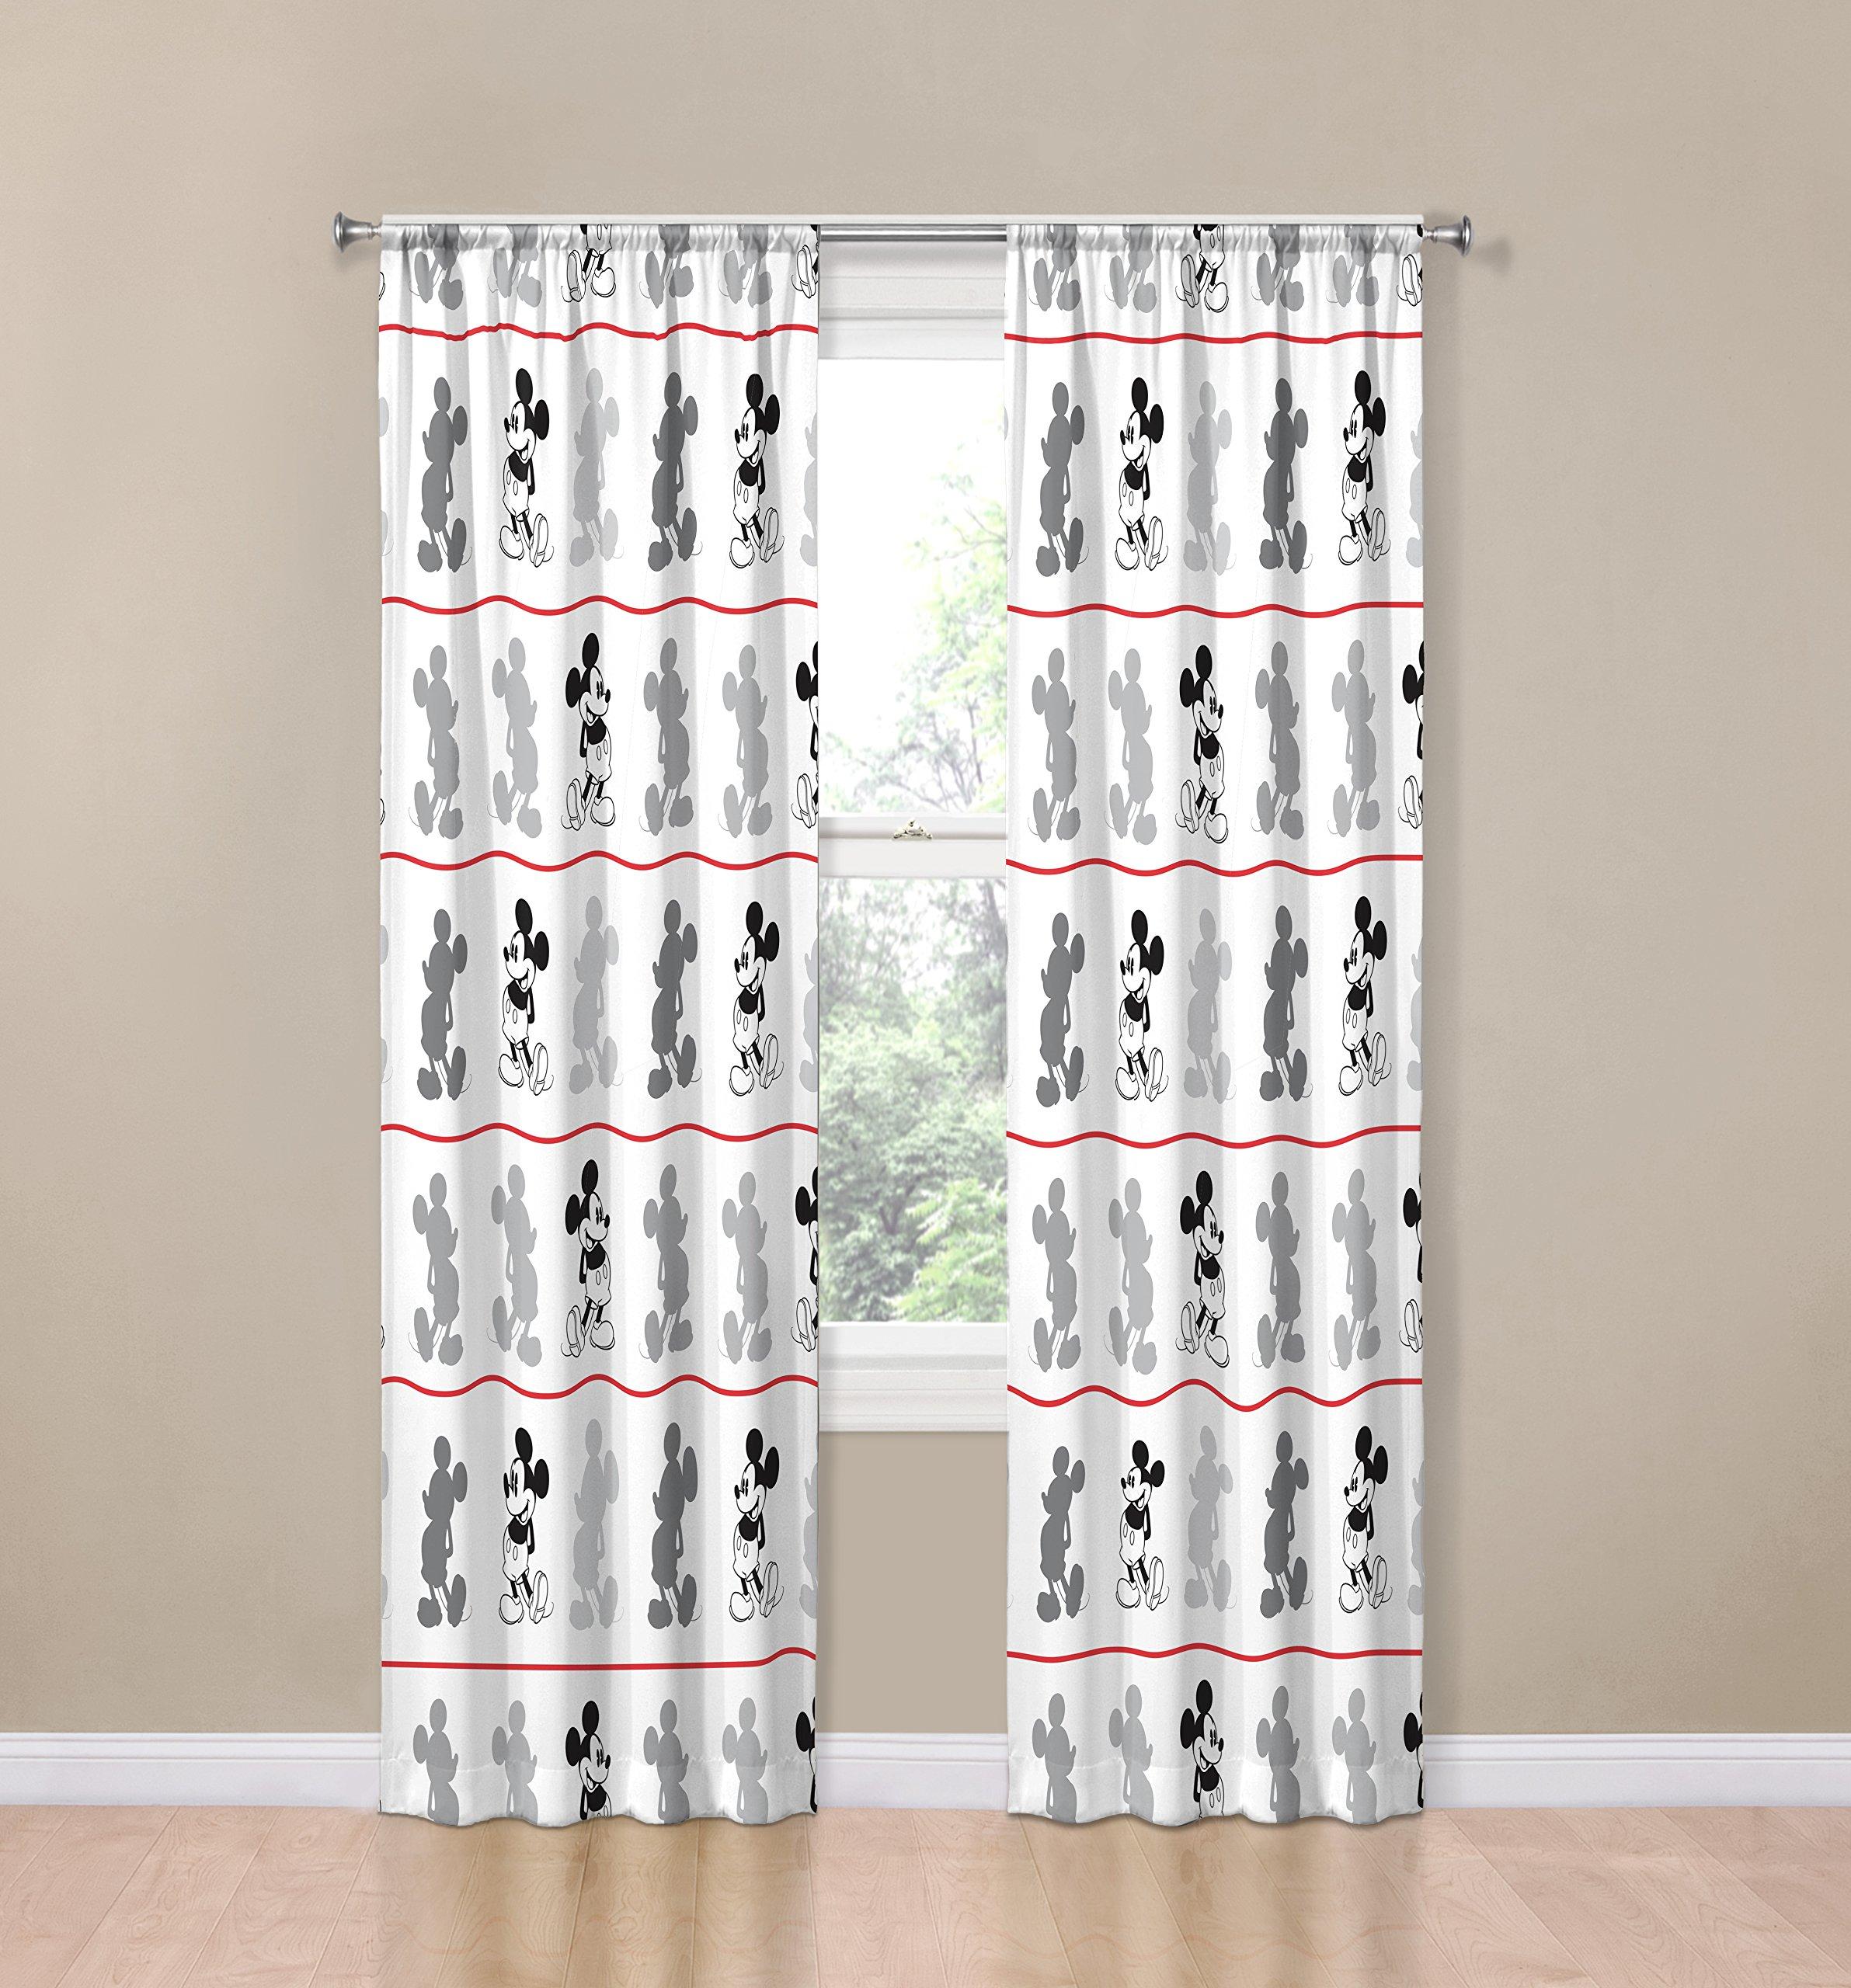 Disney Mickey Mouse Jersey White 4 Piece 84'' Curtain/Drapes Set (2 Panels, 2 Tiebacks)